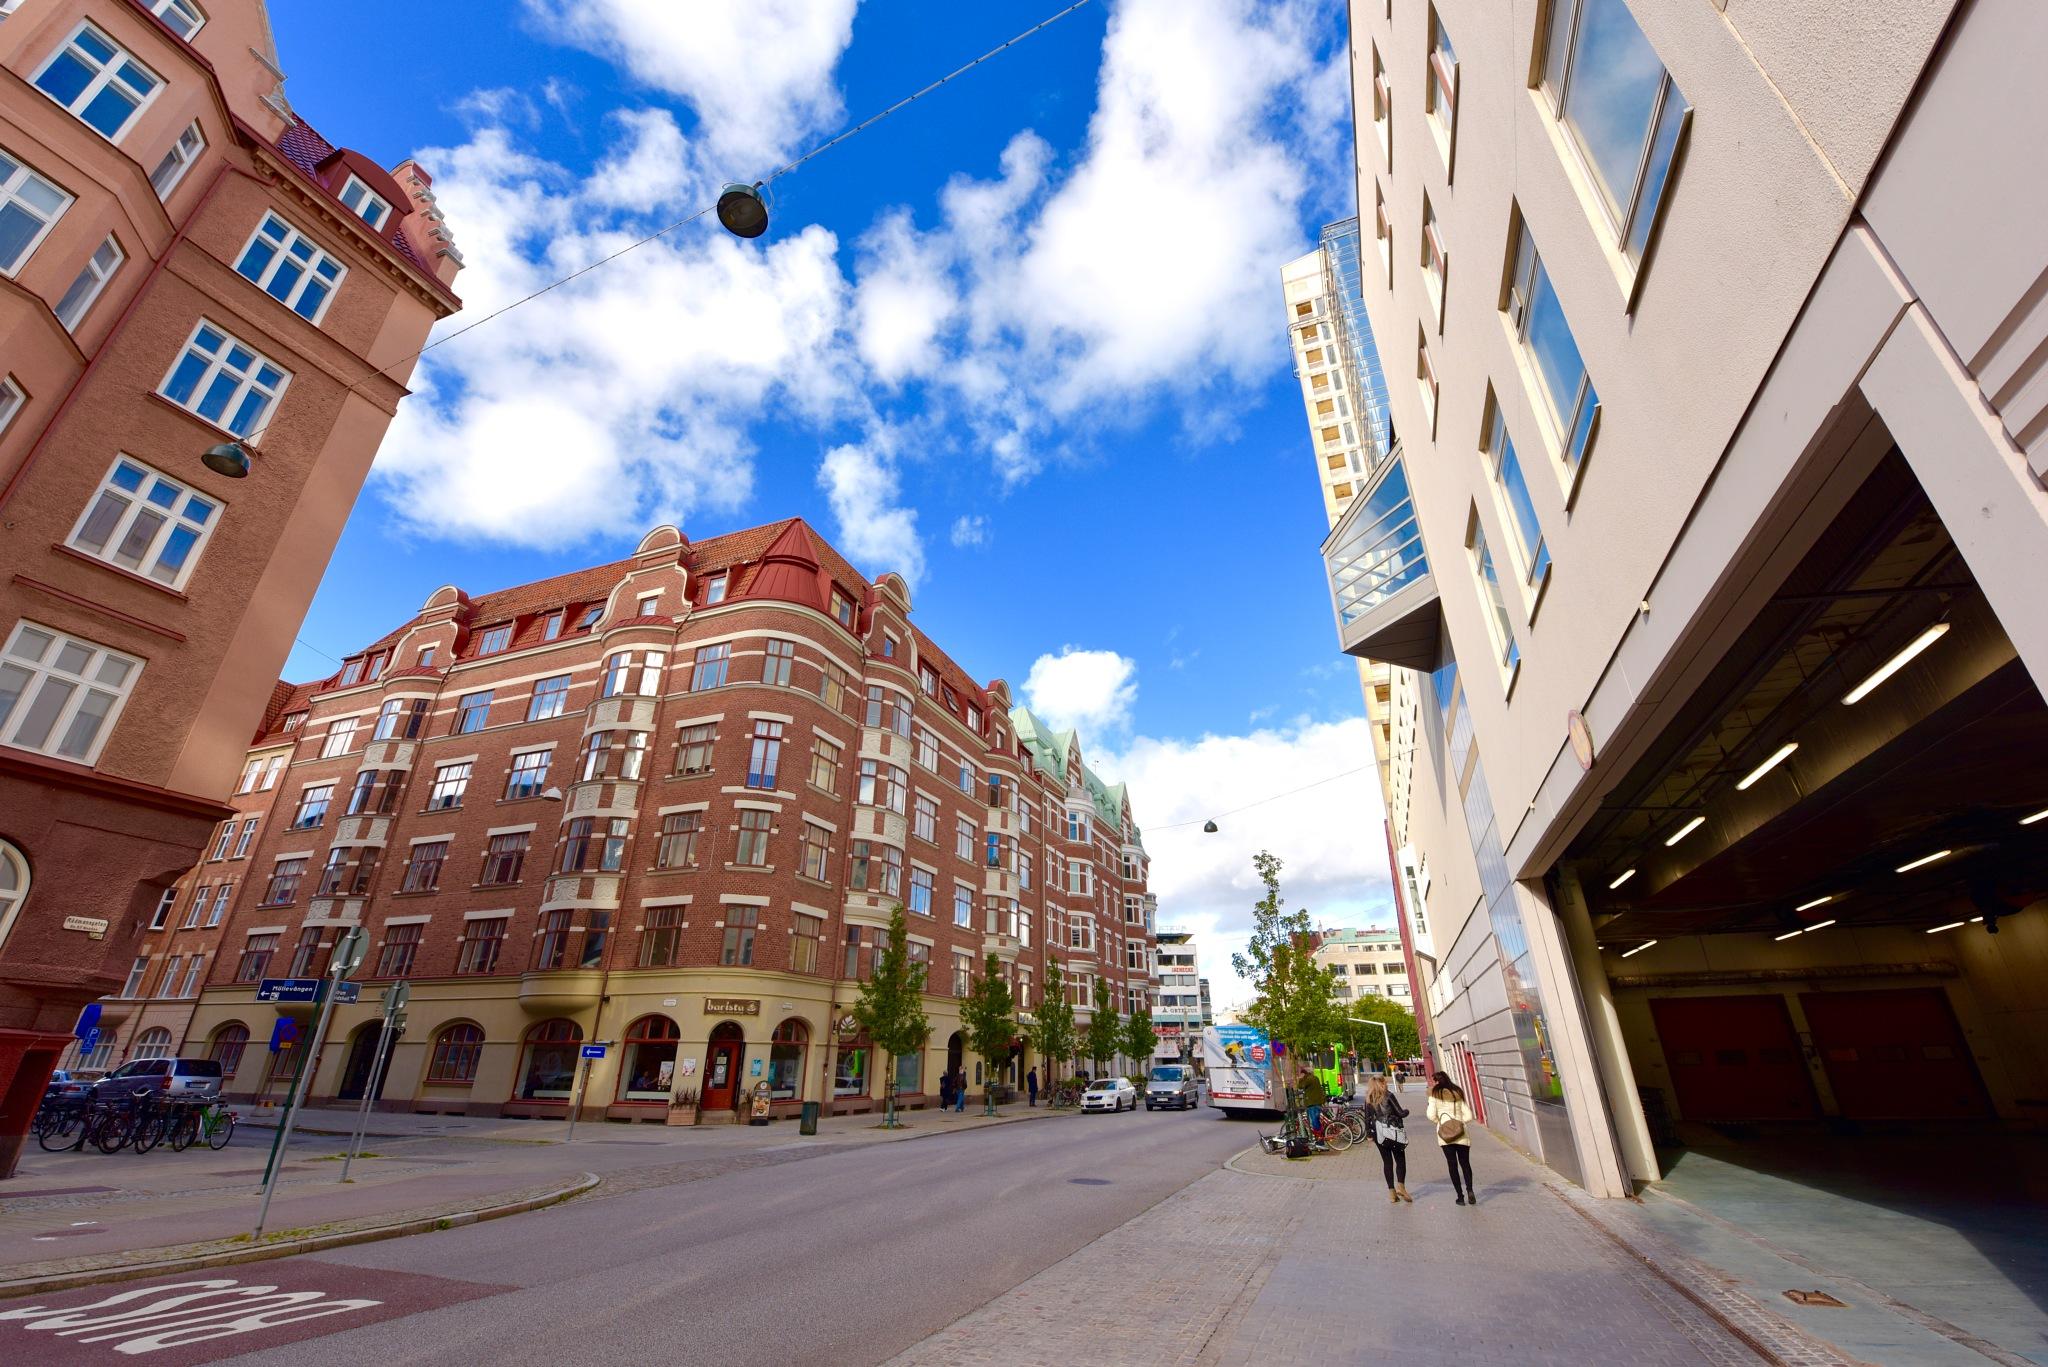 Malmö city 5! by Memed Bayatli